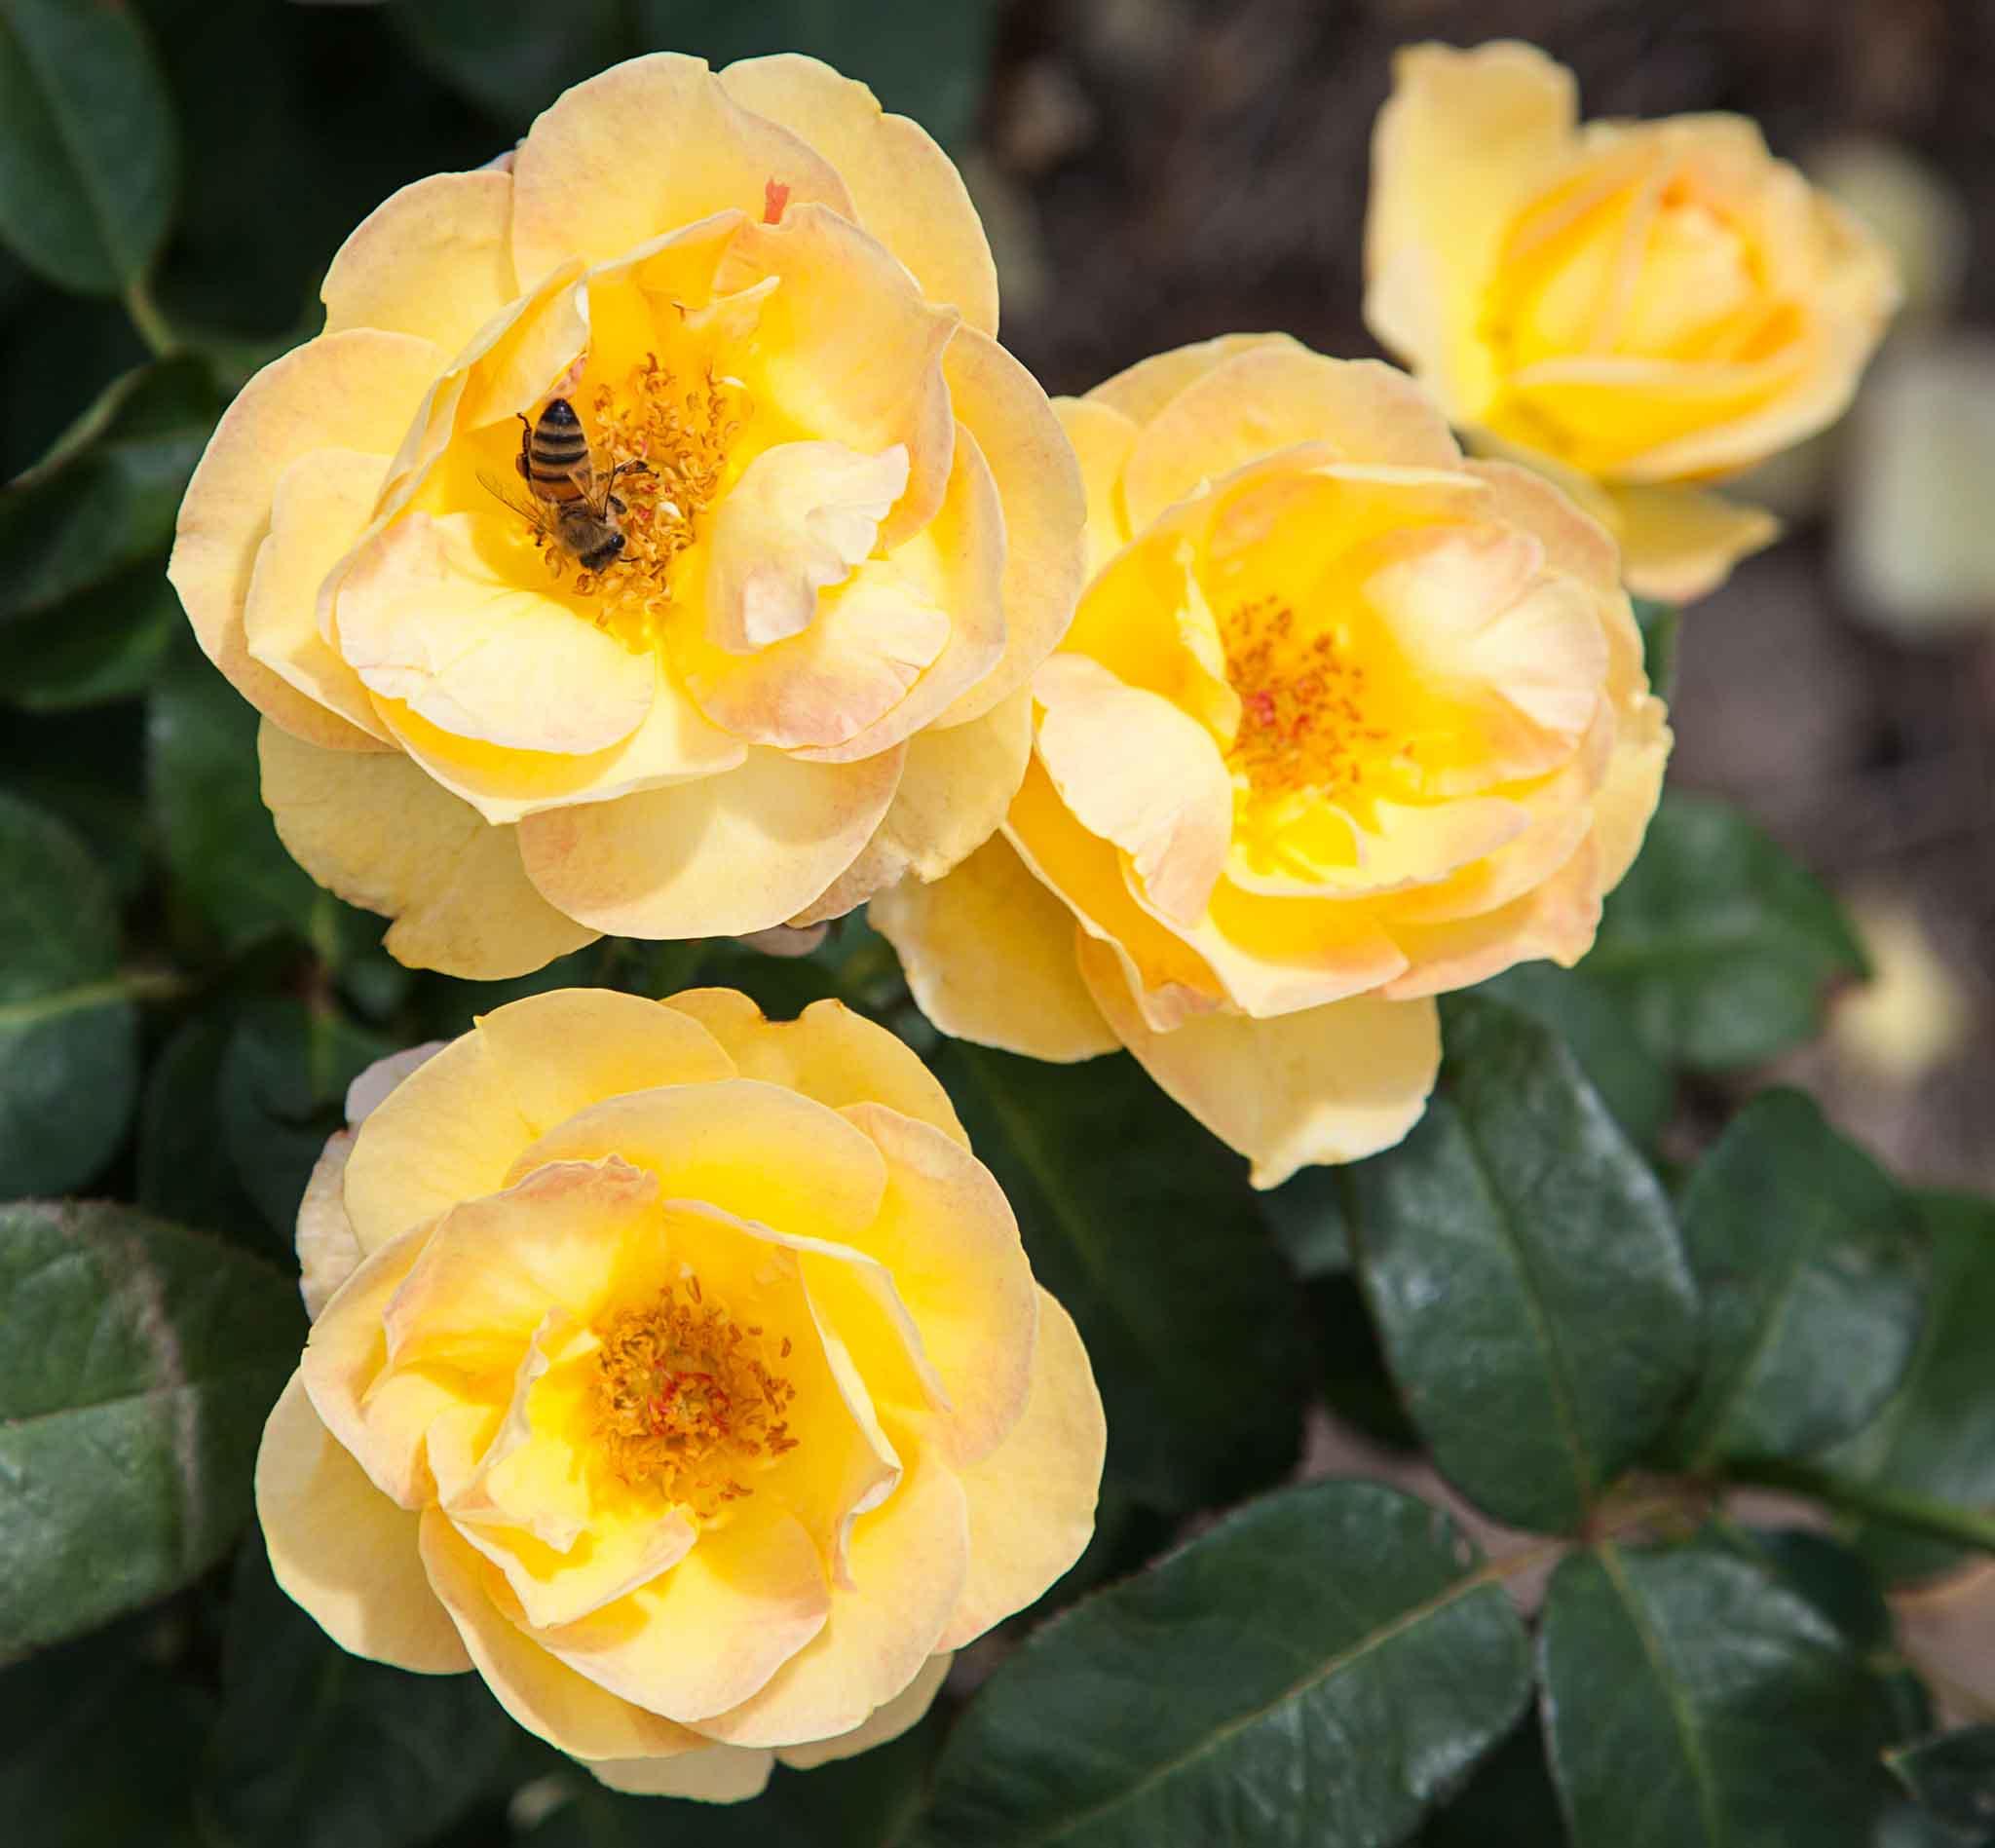 roses-reduced-16.jpg